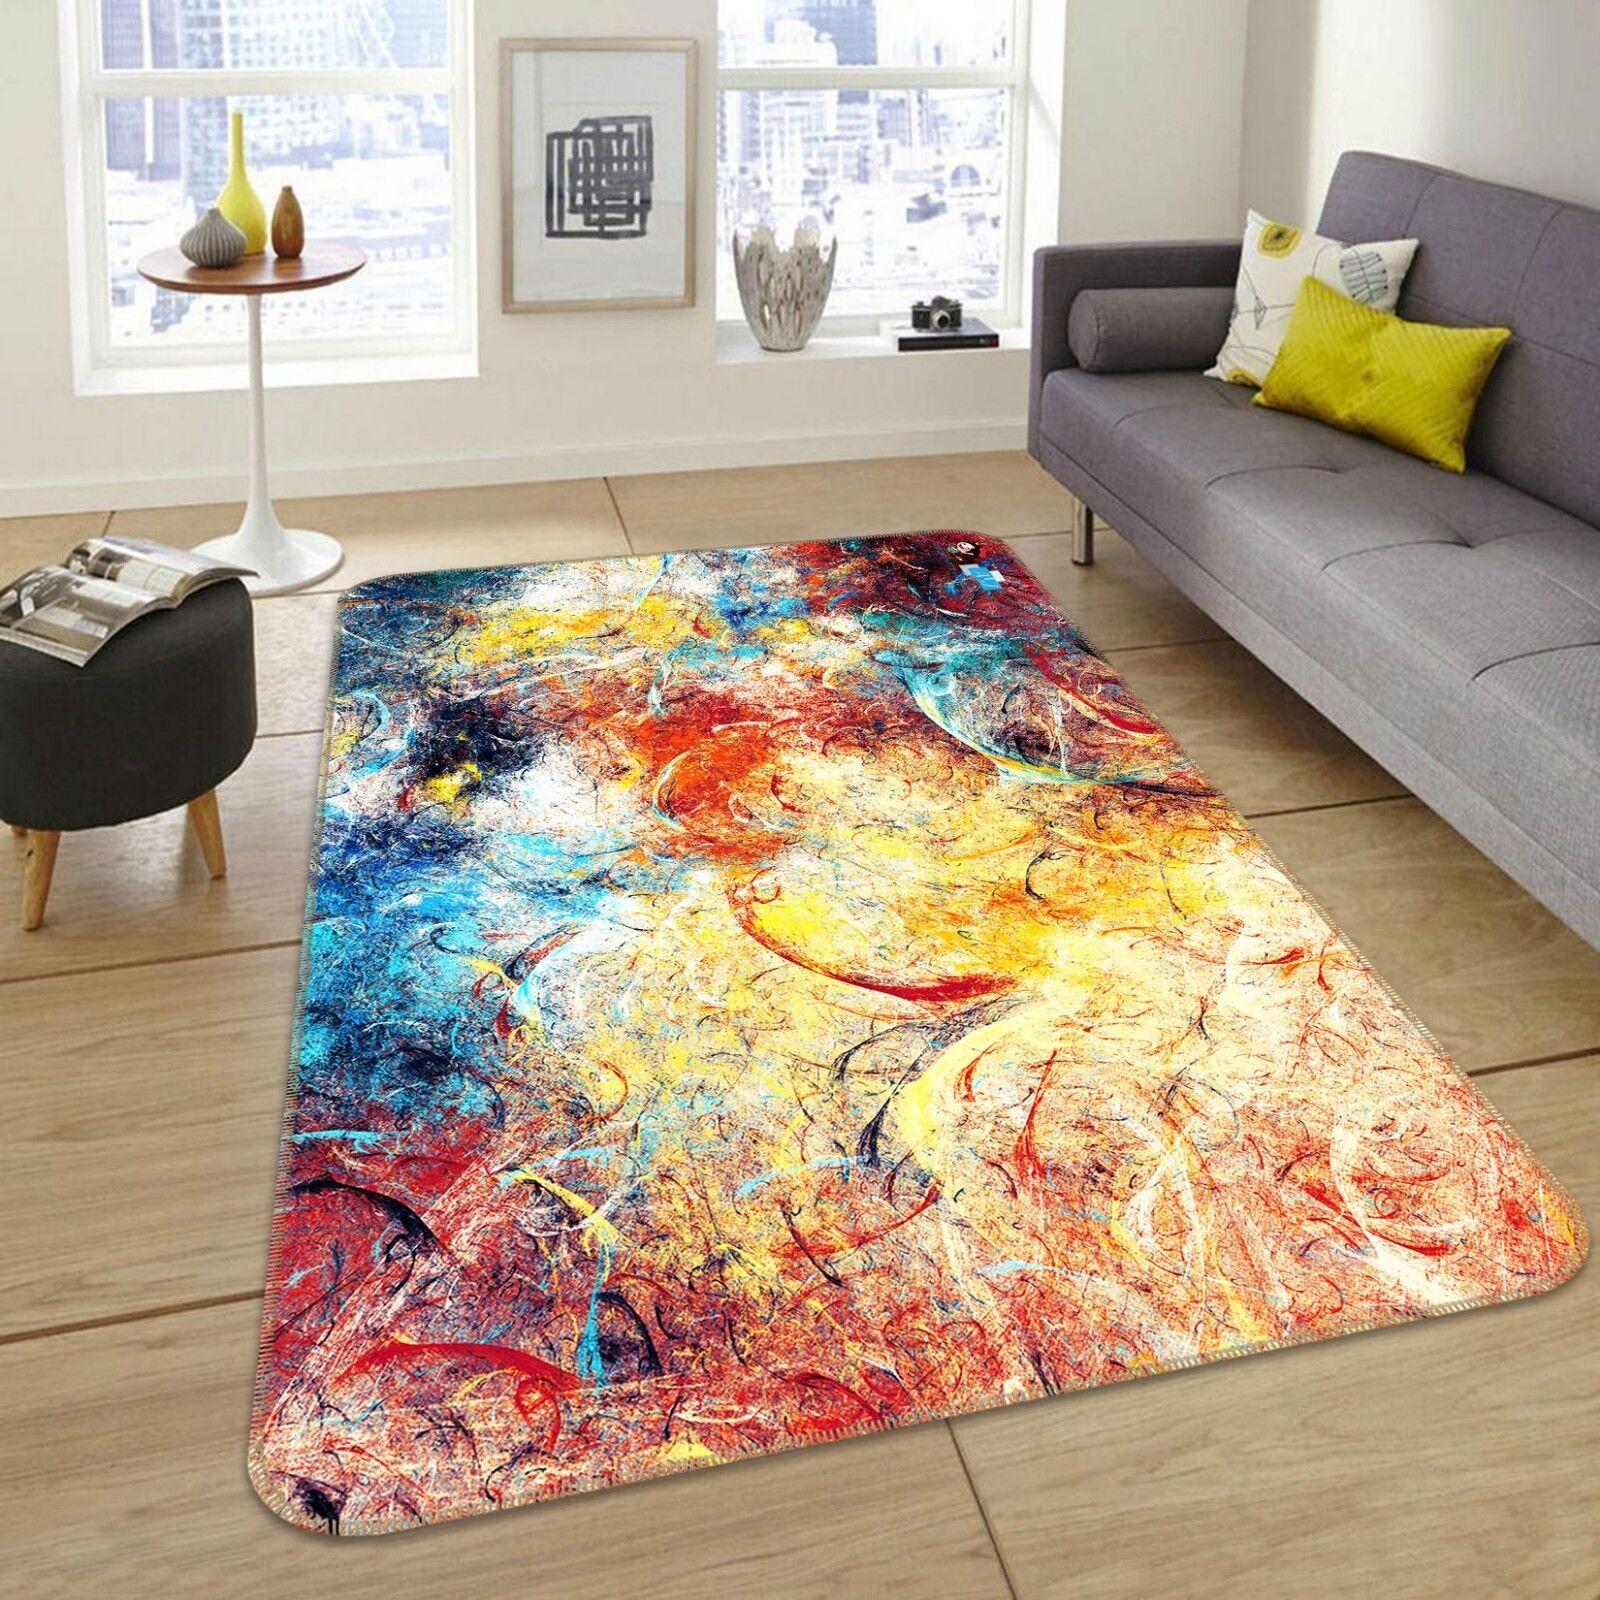 3D Oil Paint Graffiti 1 Non Slip Rug Mat Room Mat Quality Elegant Photo Carpet